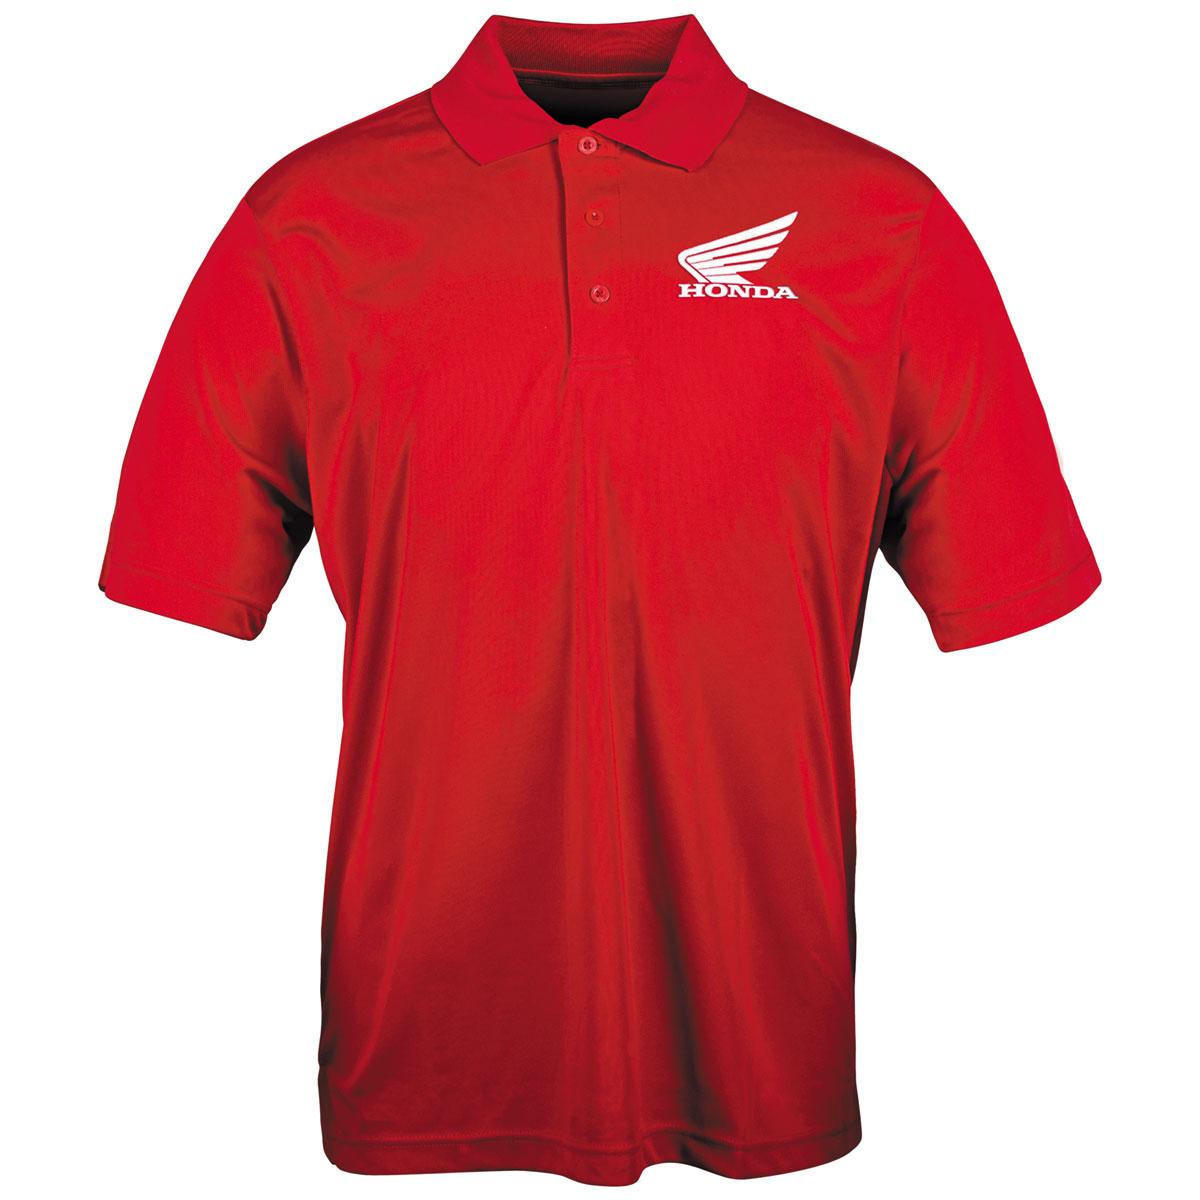 Honda Men's Big Wing Red Polo T-Shirt